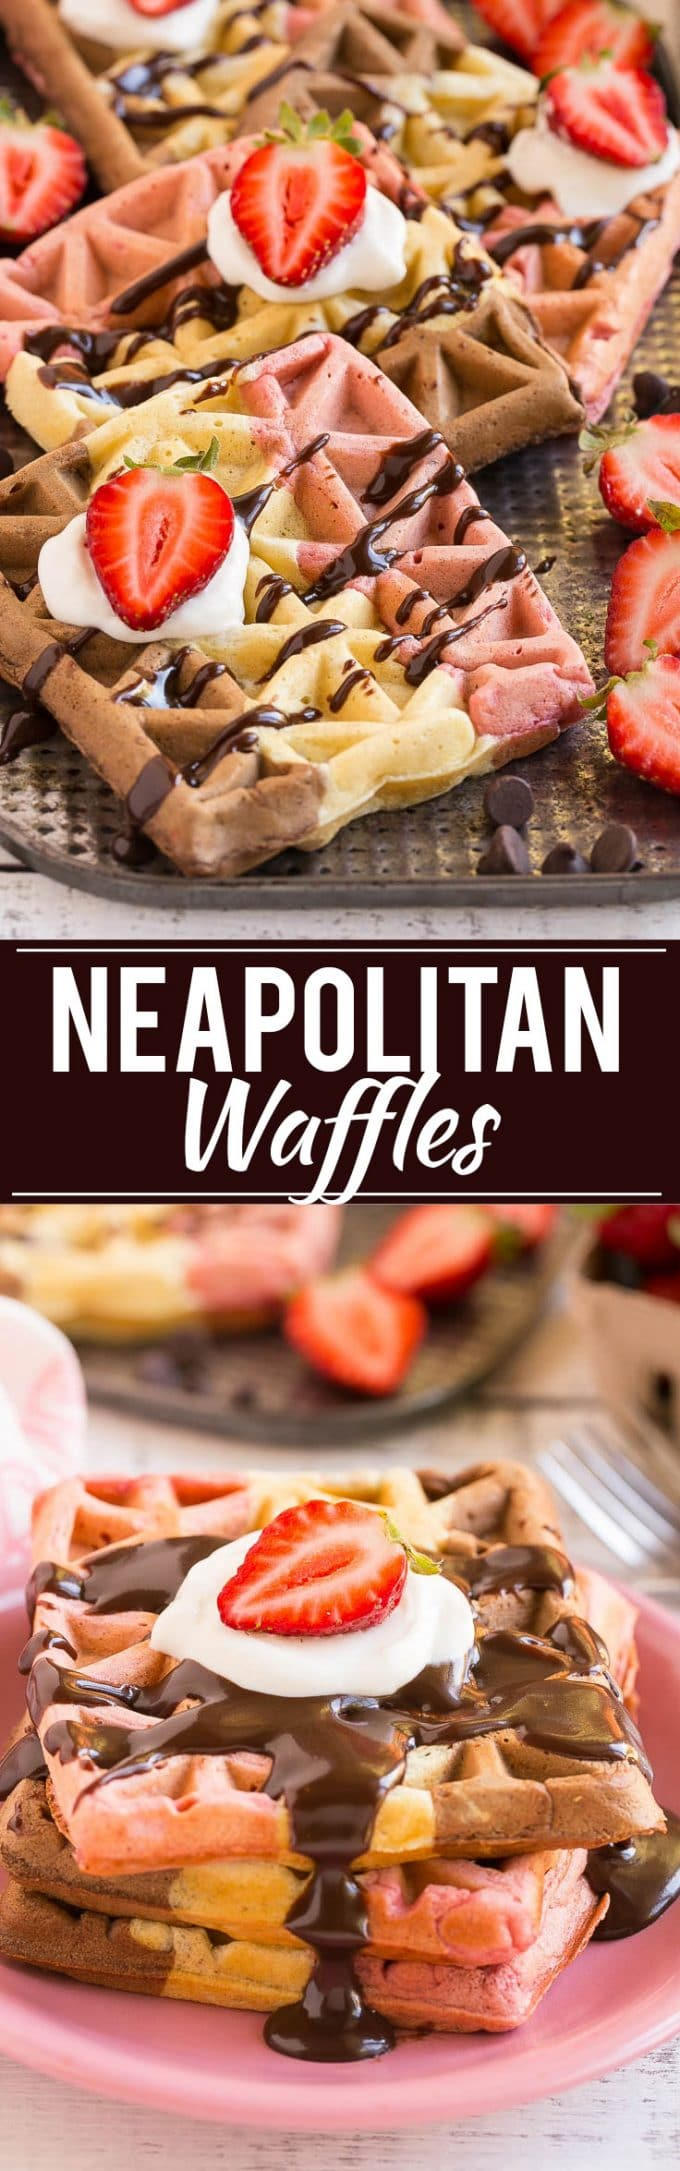 Neapolitan Waffles Recipe | Chocolate Strawberry Vanilla Waffles | Easy Neapolitan Waffles | Best Neapolitan Waffles